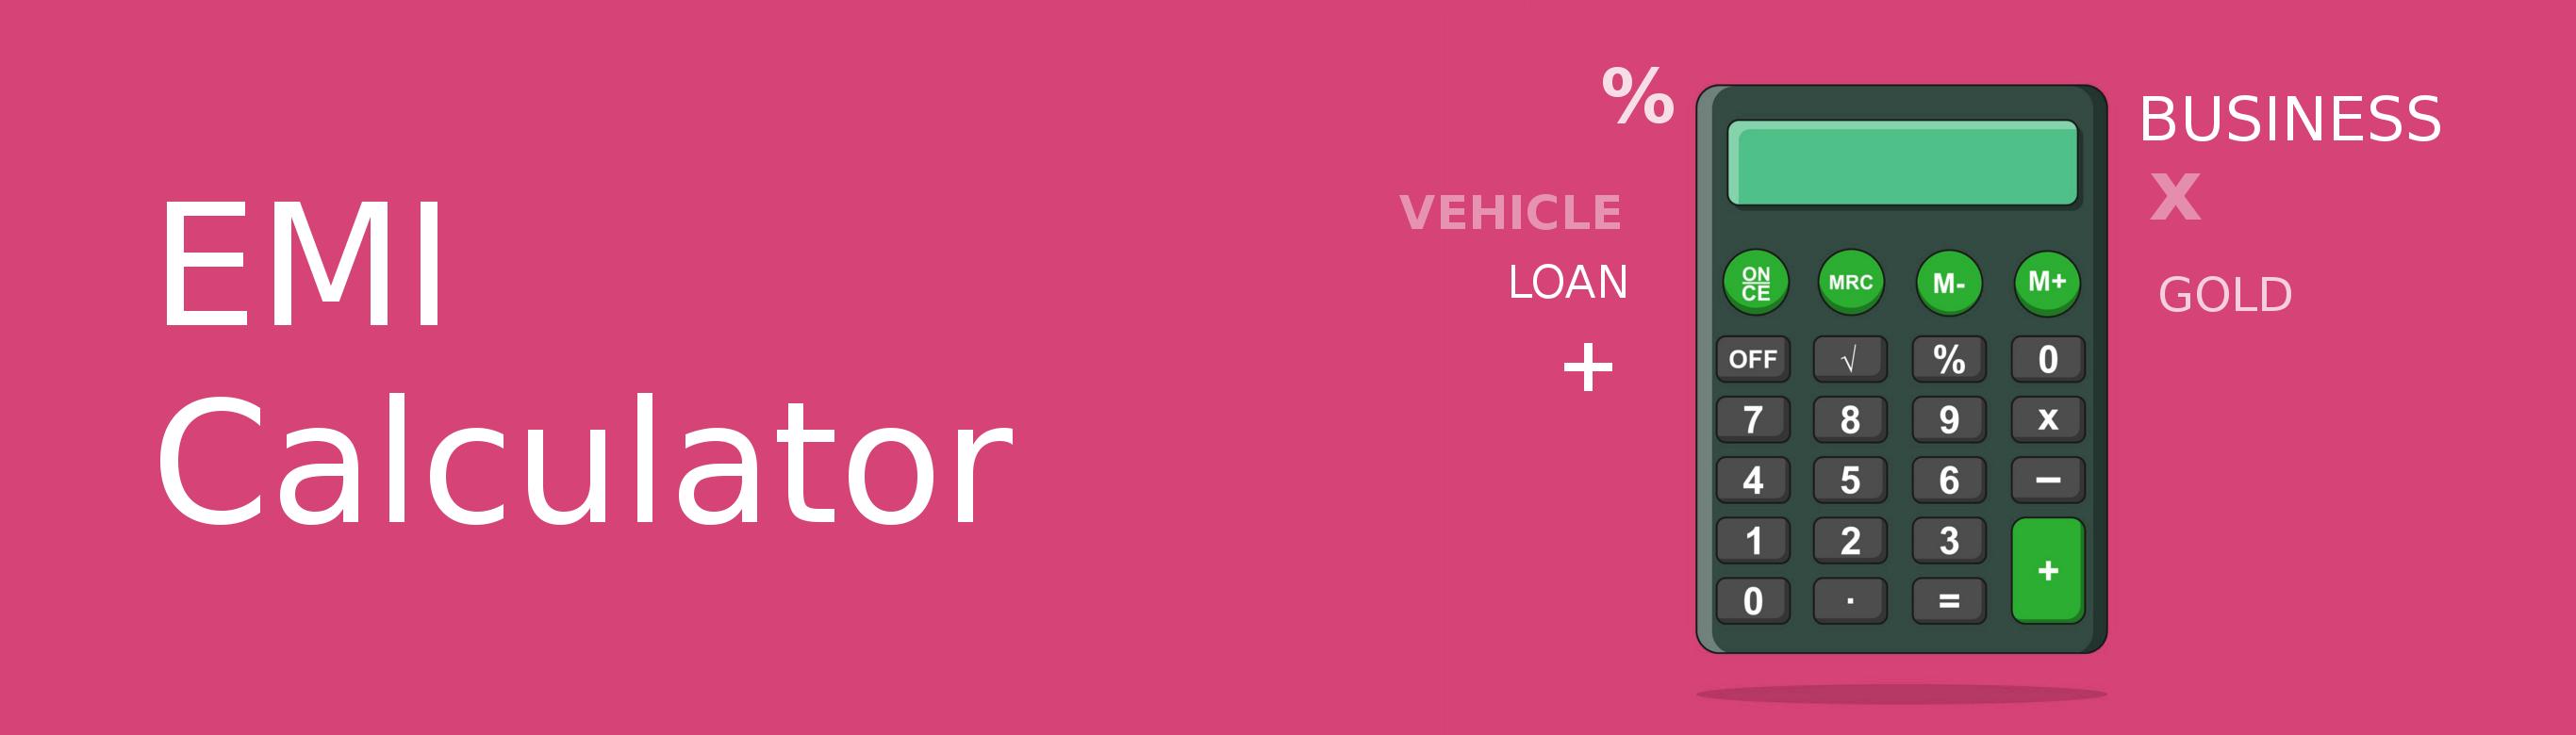 Best Online Emi Calculator For Home Loan Home Loans Loan Amortization Schedule